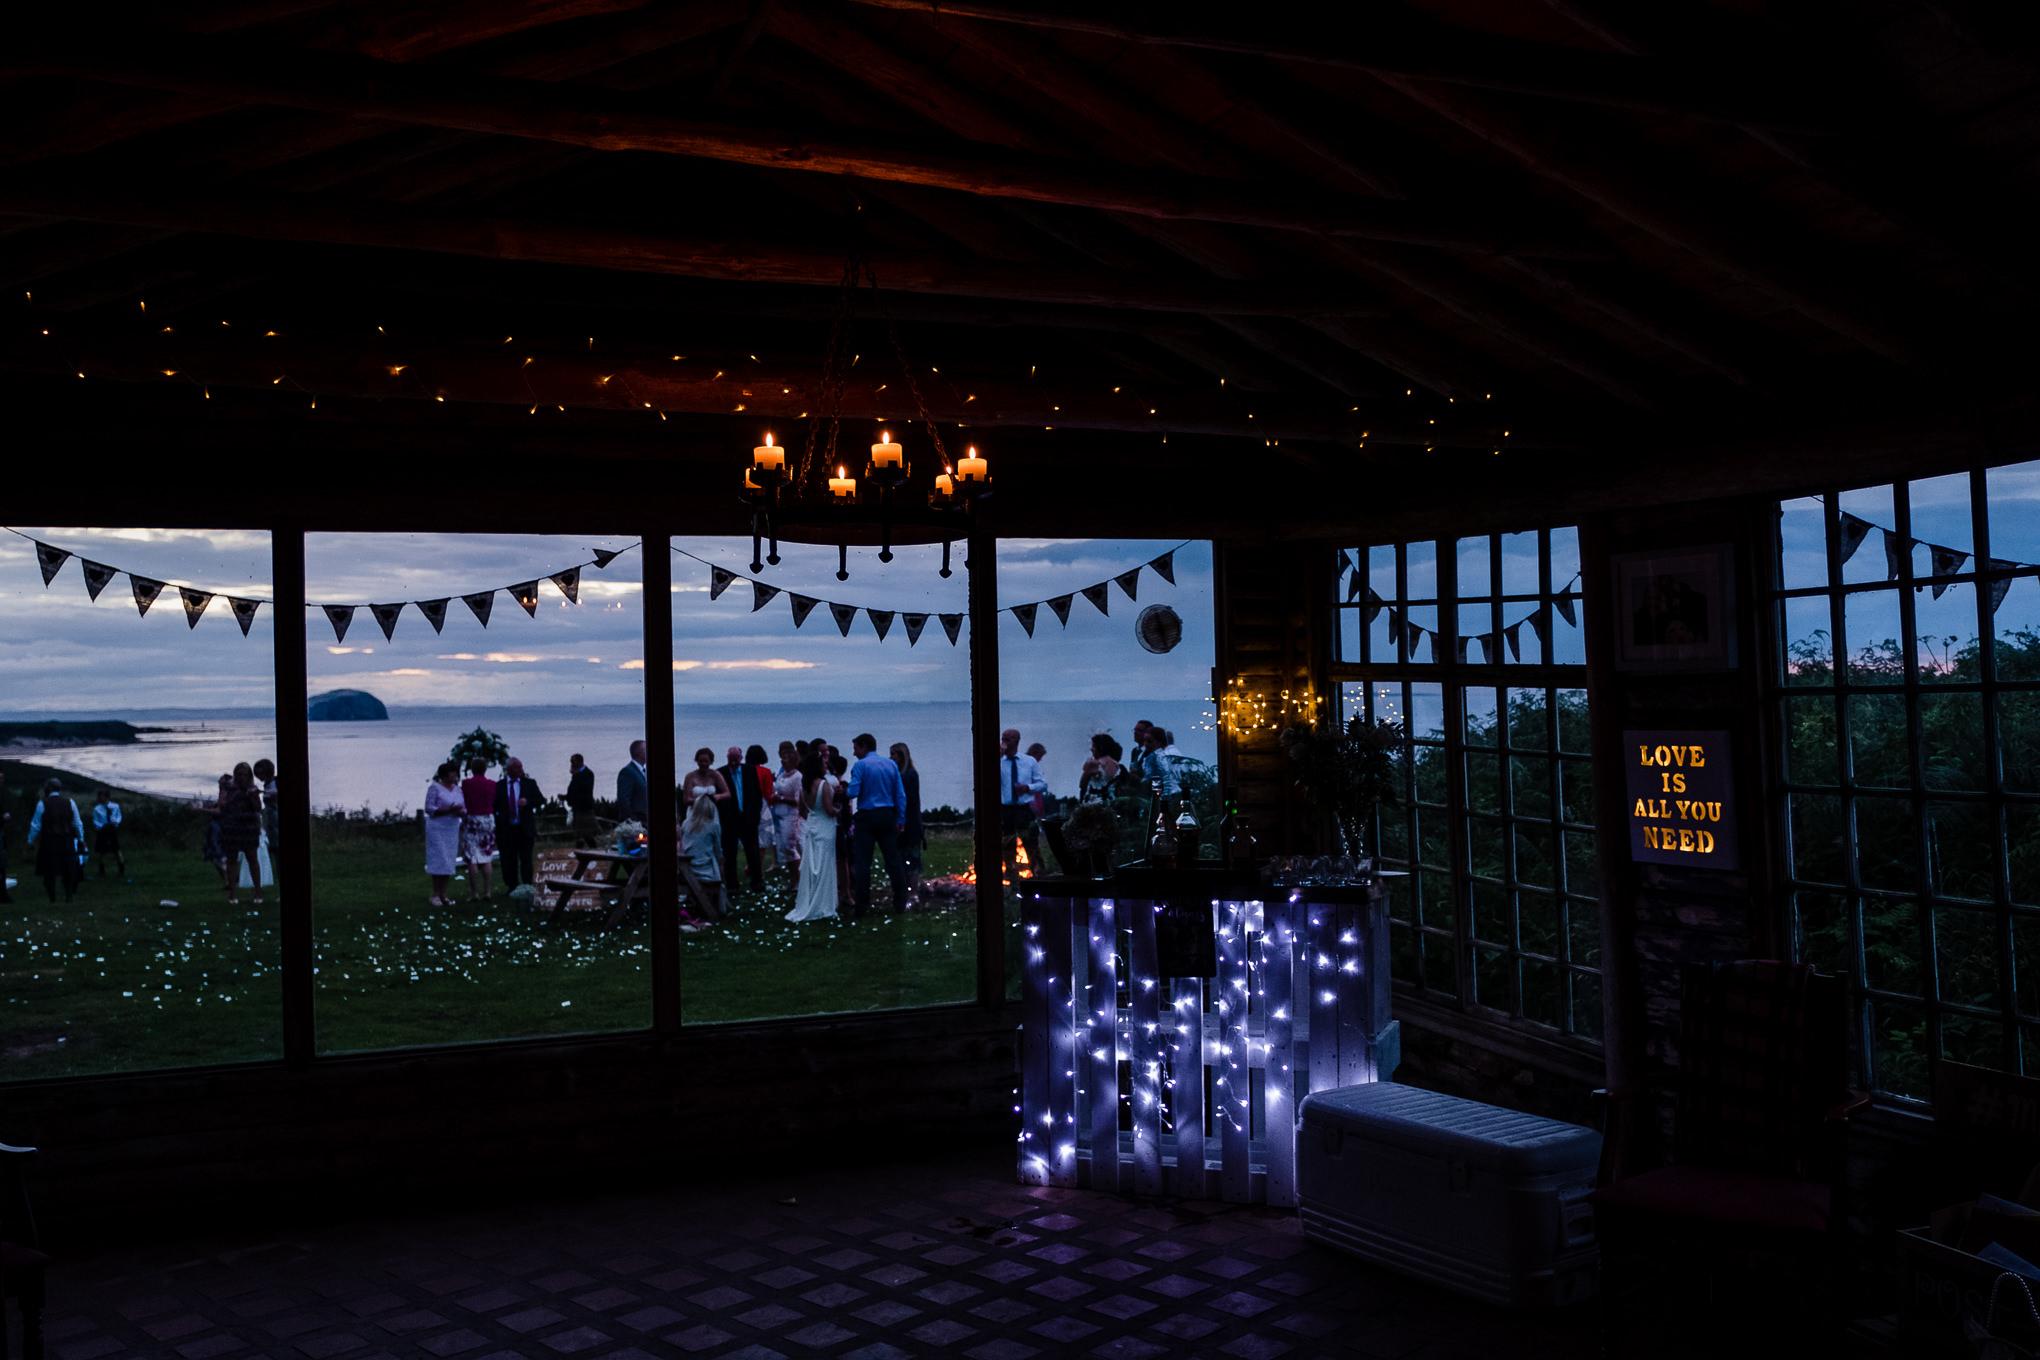 20170729_Ravensheugh Log Cabin Wedding_006.jpg